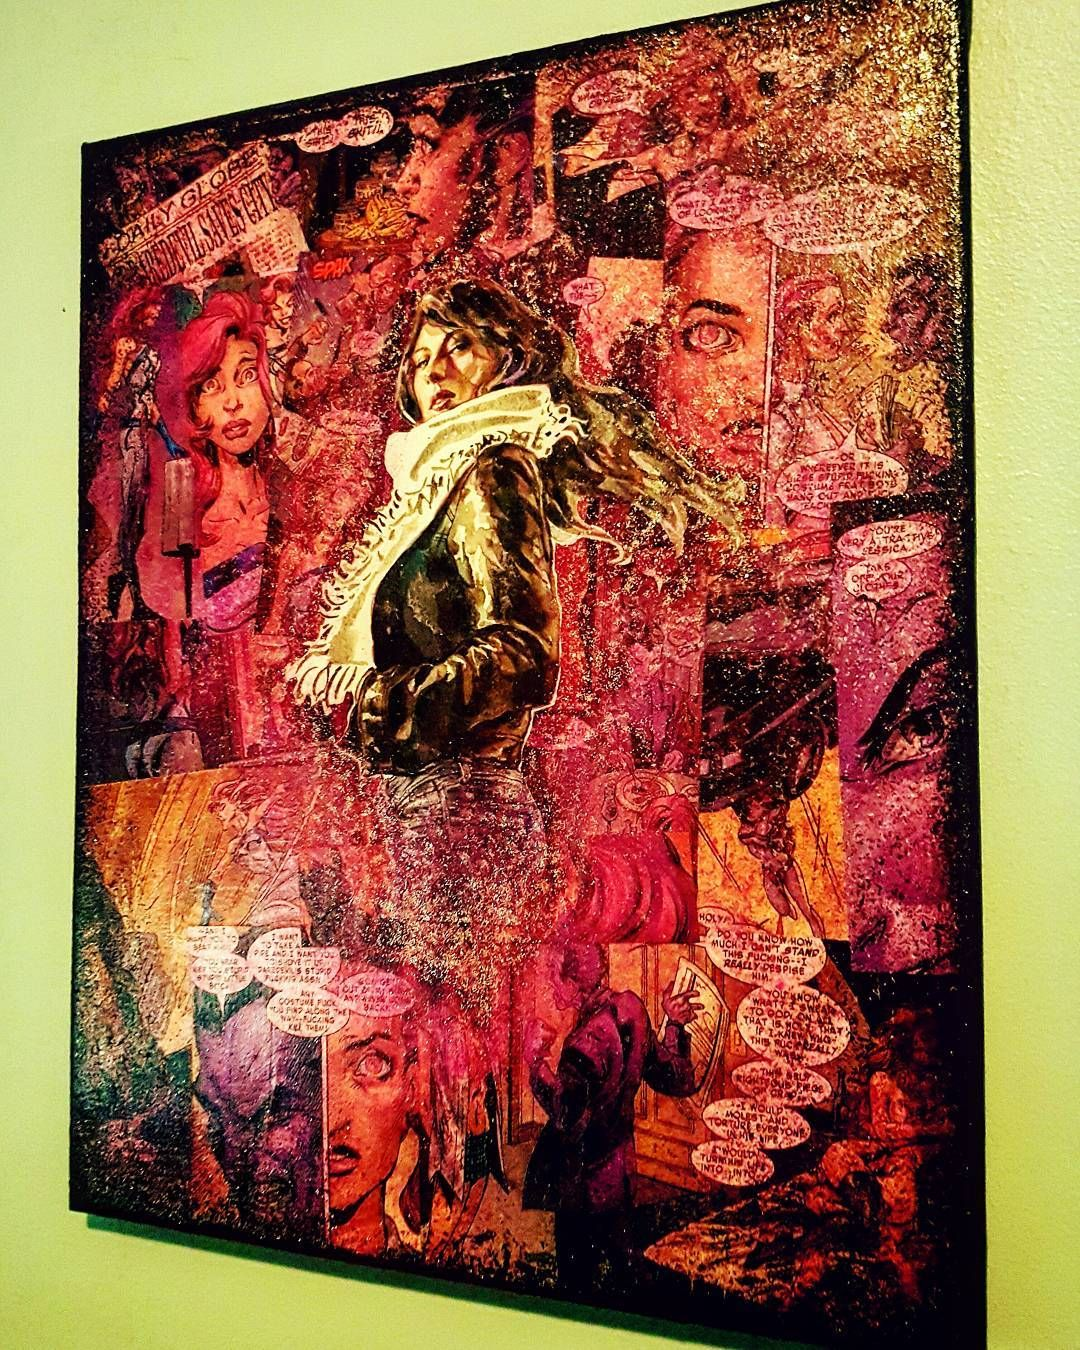 Jessica Jones   #jessicajones #alias #netflix #marvel #comics #upcycle #defenders #purple #purpleman #detective #superhero #lukecage #daredevil #ironfist #handmade #etsy #montreal #artlife #instagallery #followme